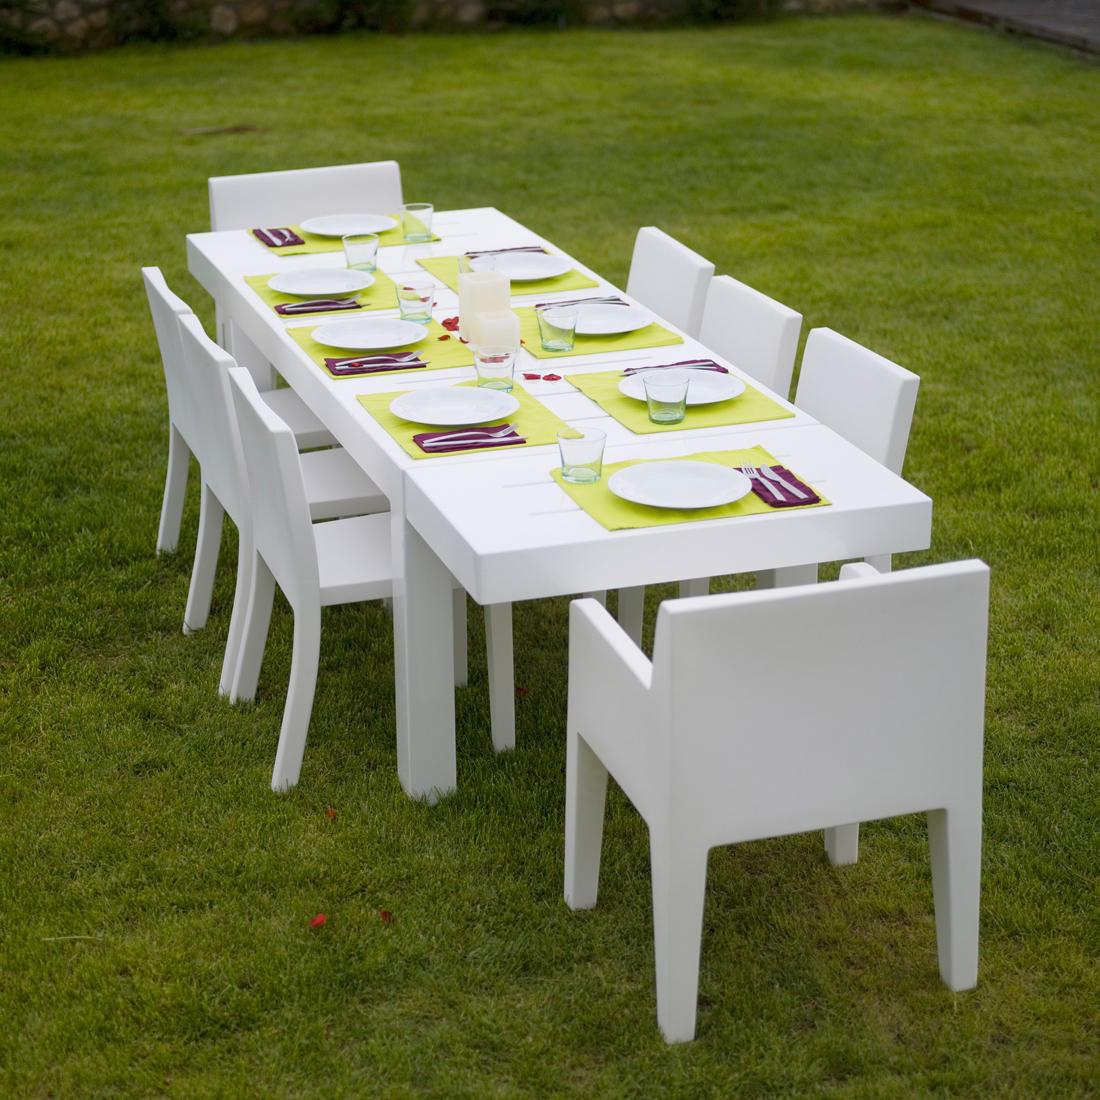 Jut Table 280 Tavoli Da Pranzo Da Giardino Di Vondom Architonic #505A10 1100 1100 Produttori Di Tavoli Da Pranzo